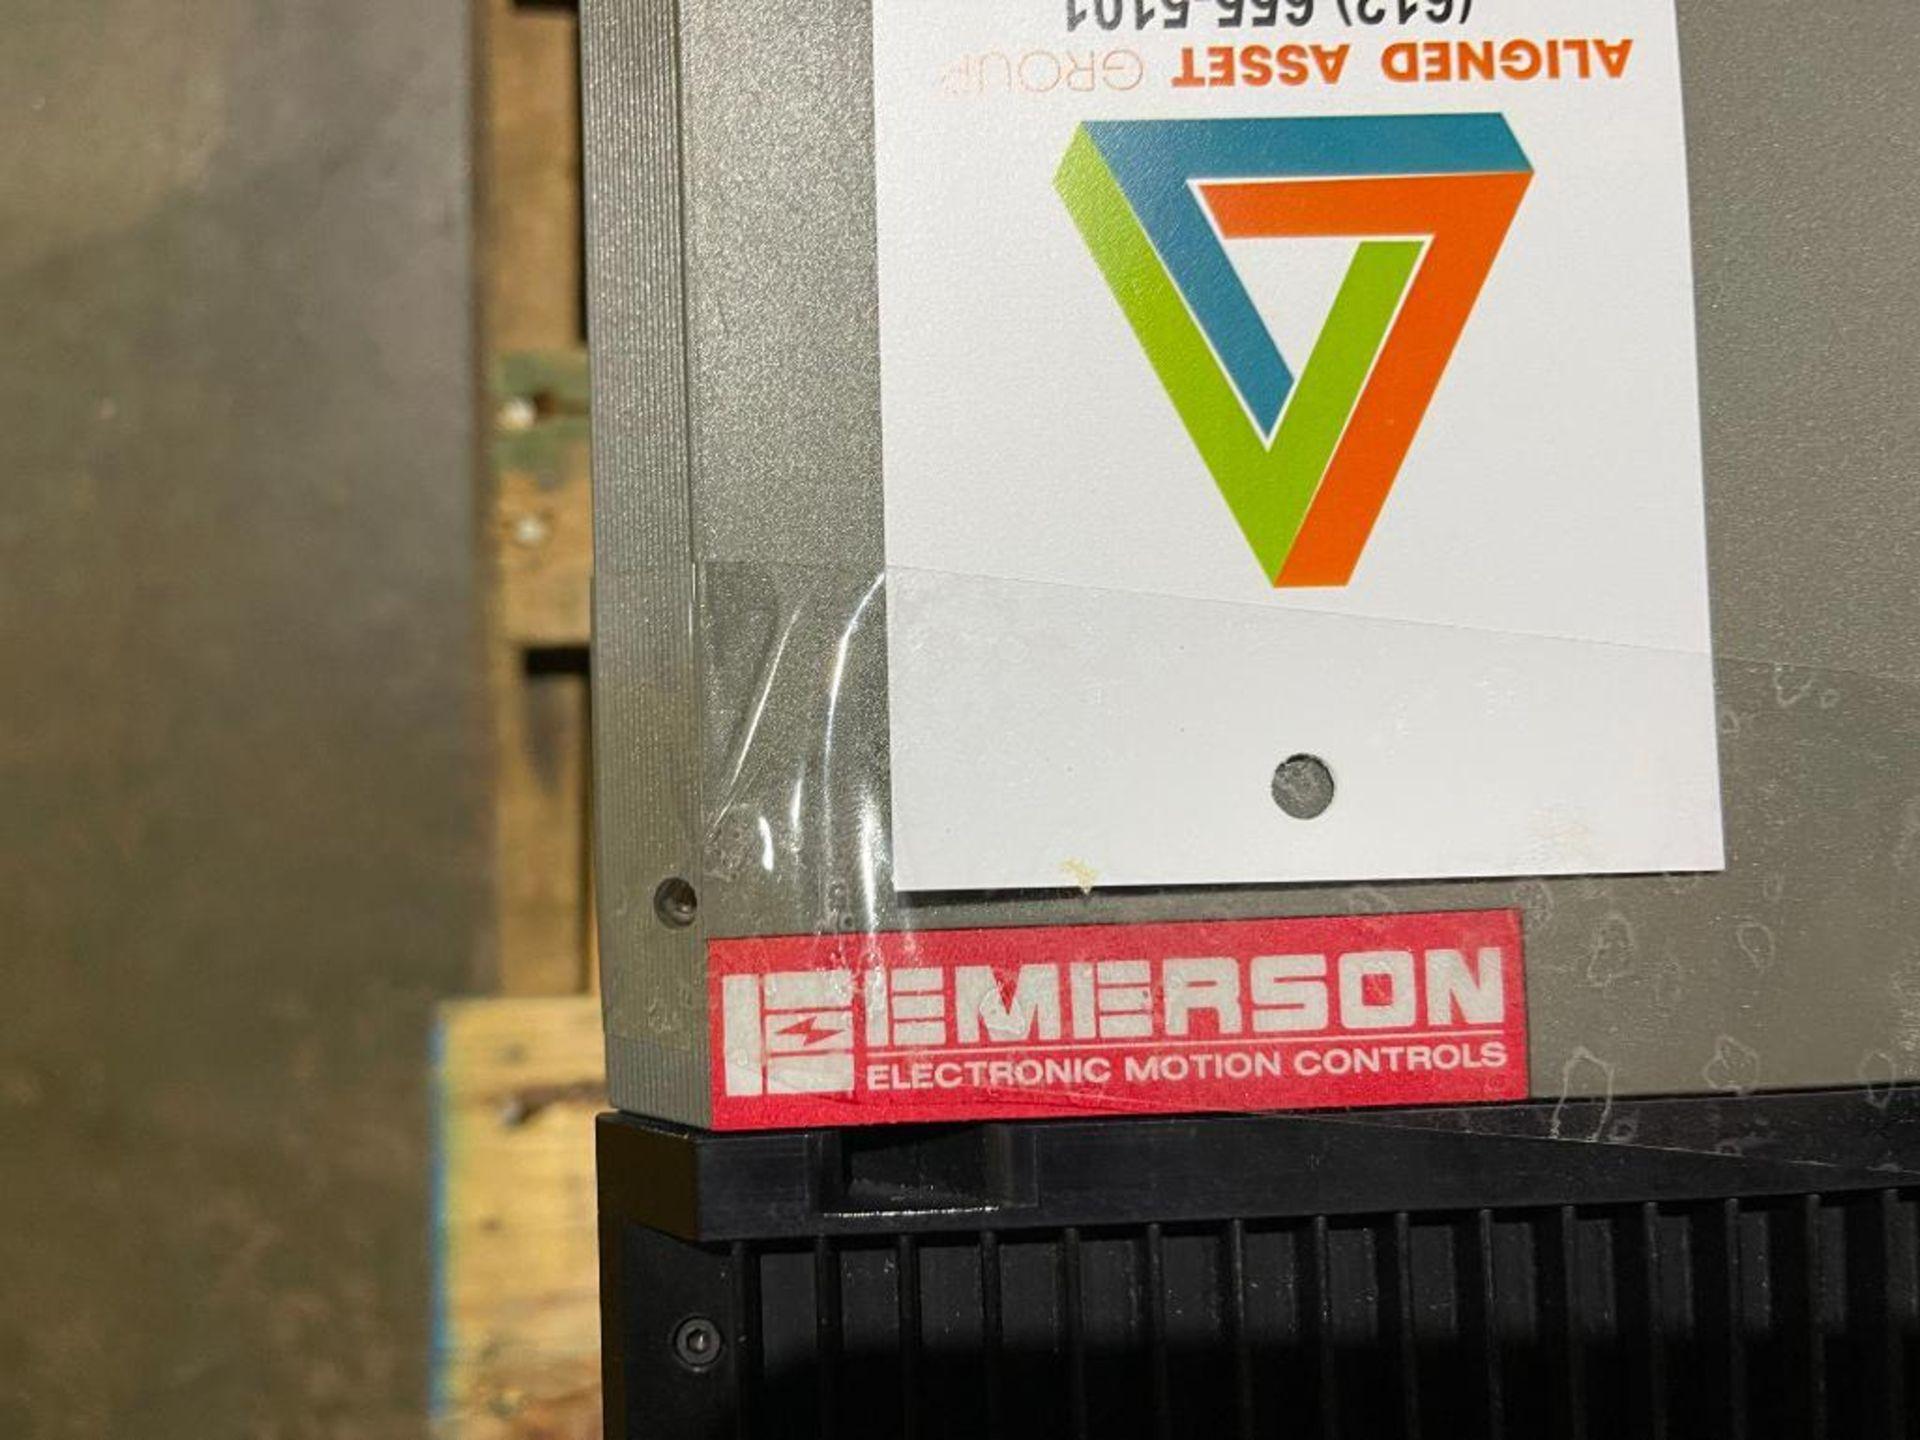 Emerson servo drive controller - Image 3 of 4